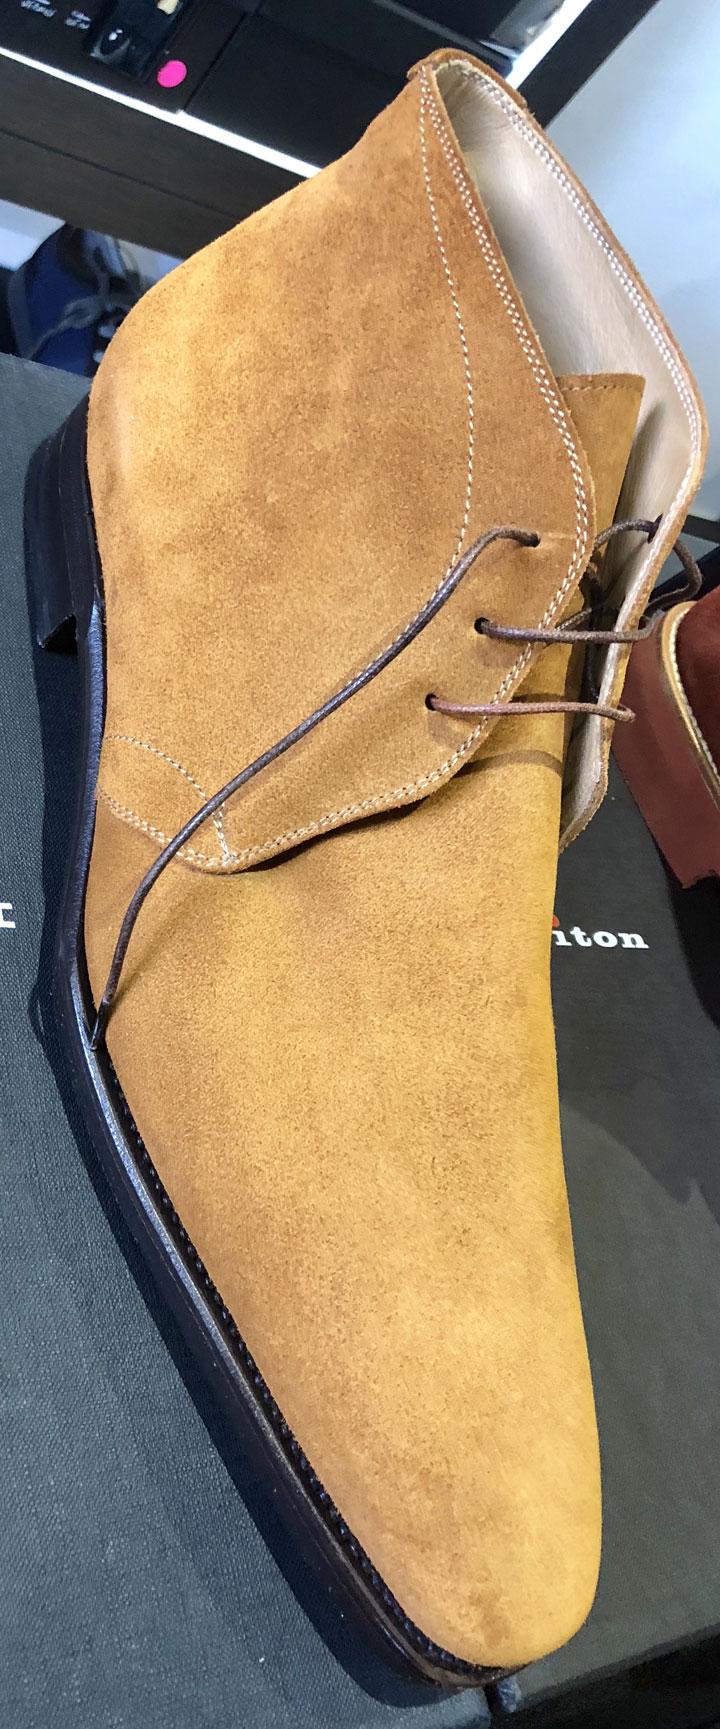 Kiton Sample Sale Shoe